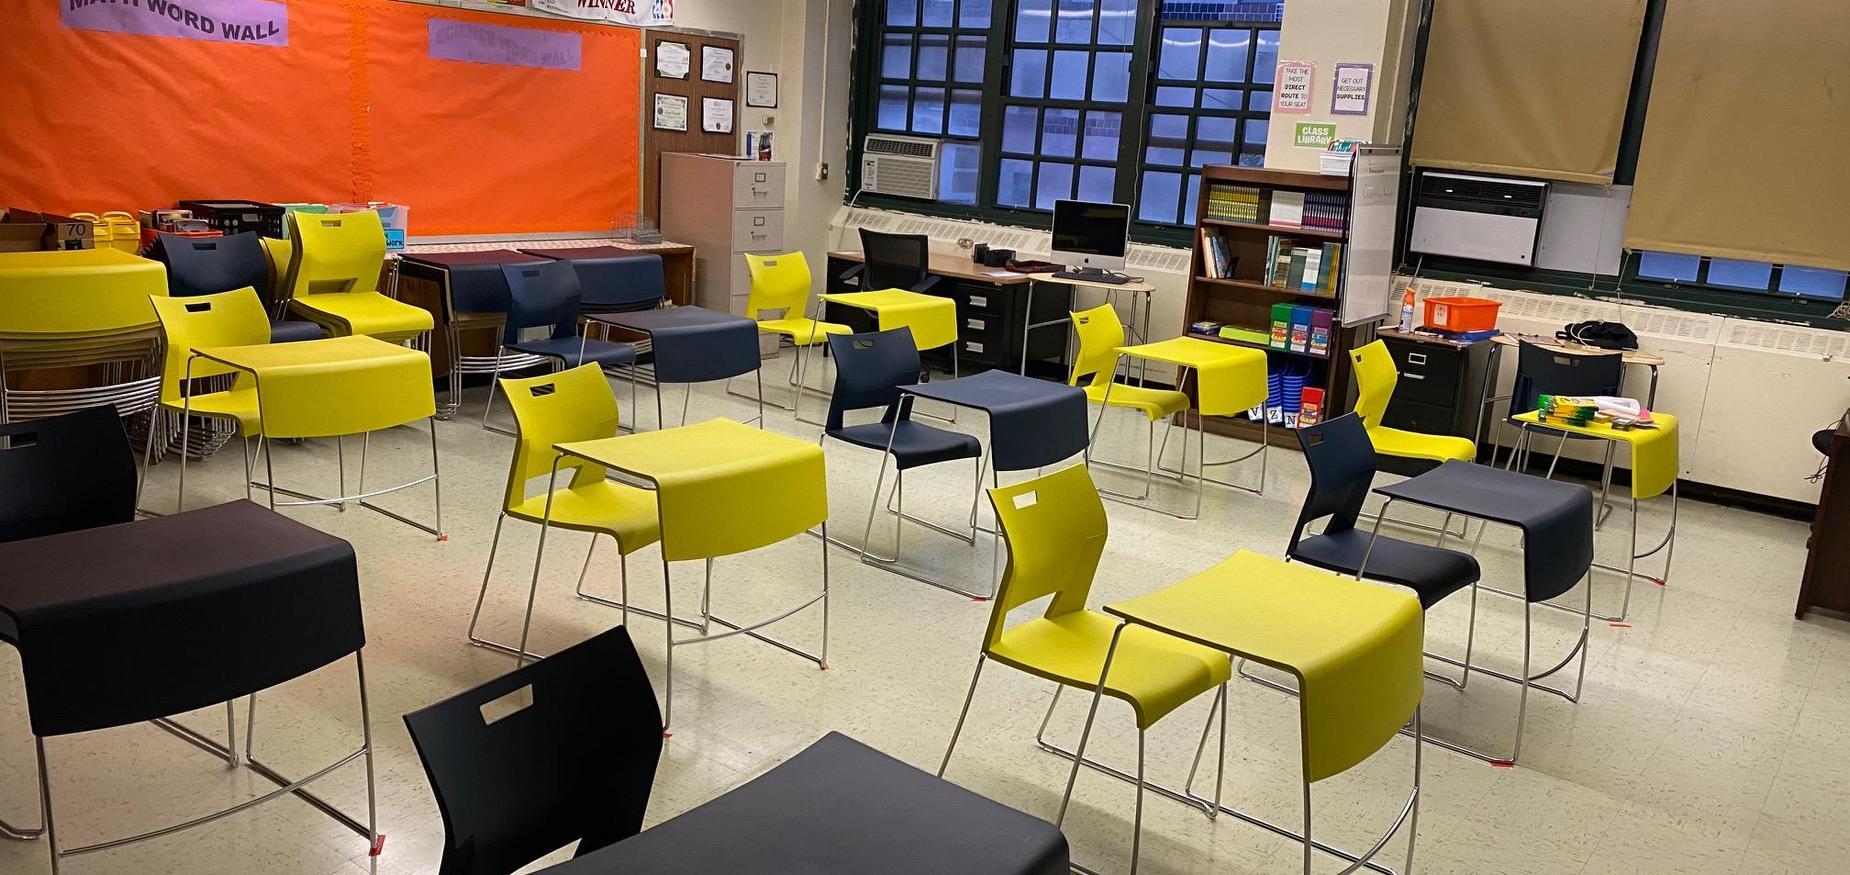 6th grade classroom